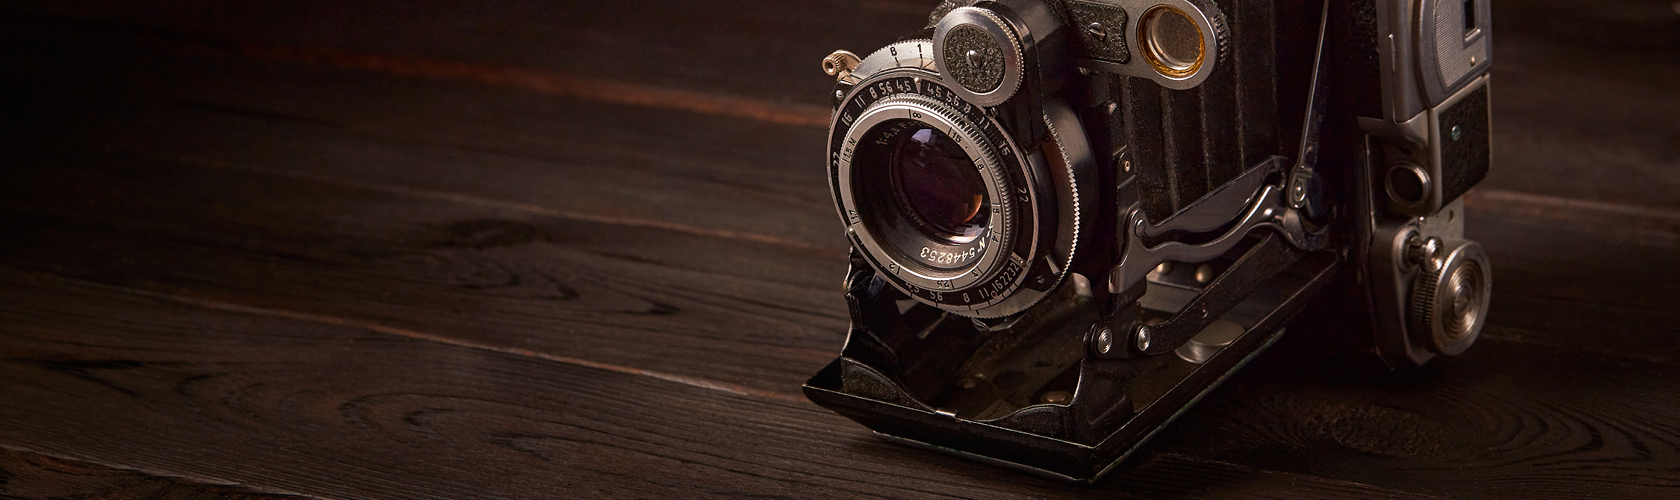 Omslagafbeelding | Filmproject Toverfoto's